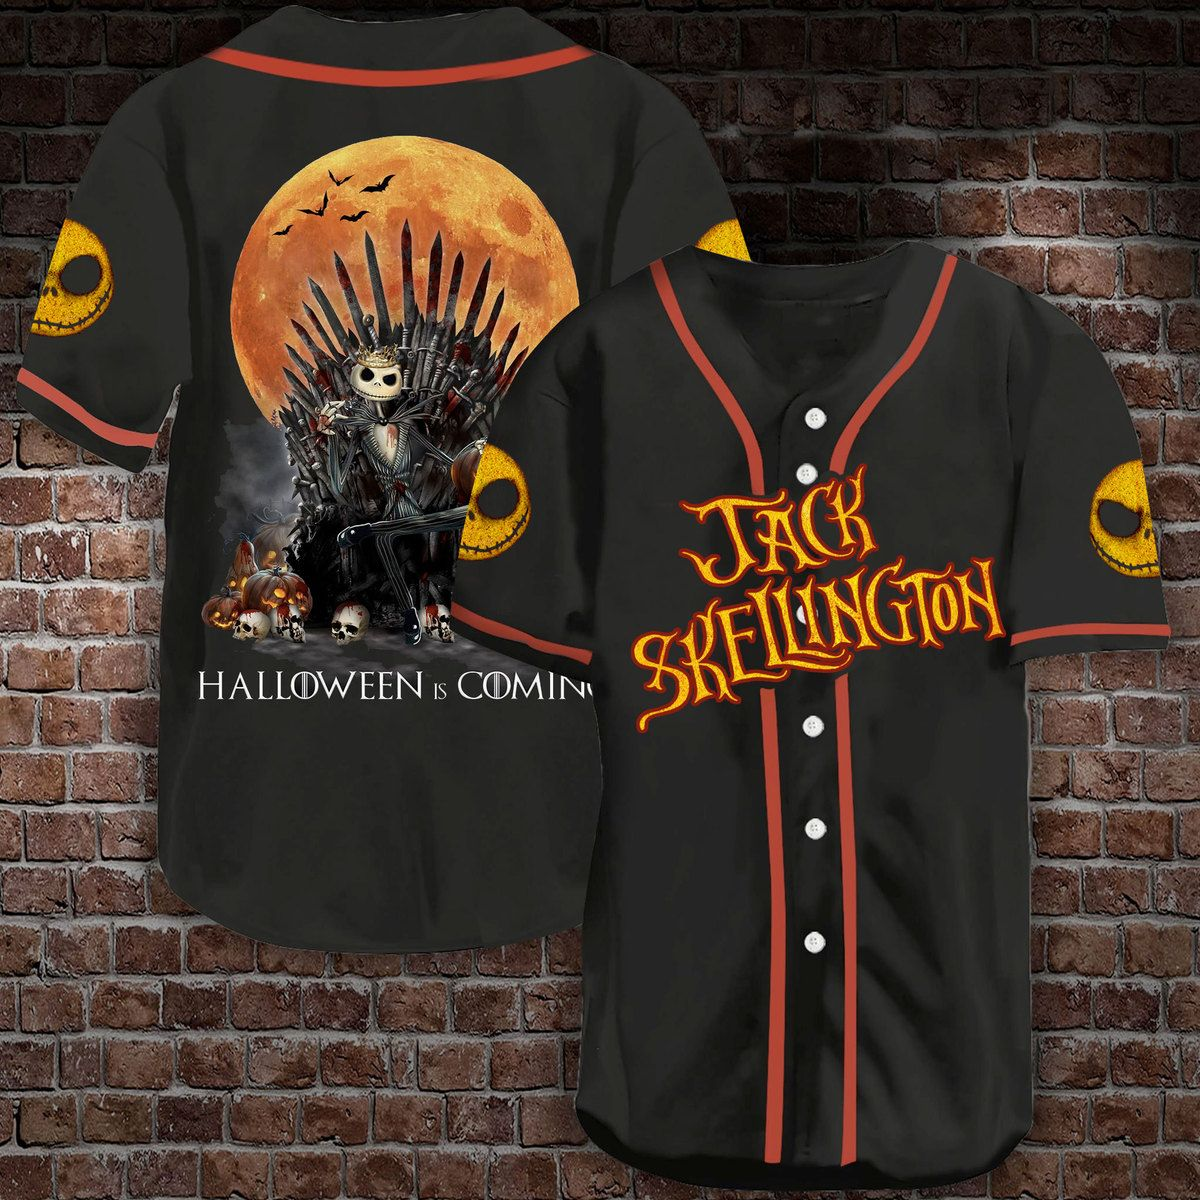 Jack Skellington Halloween is coming Baseball Jersey Shirt